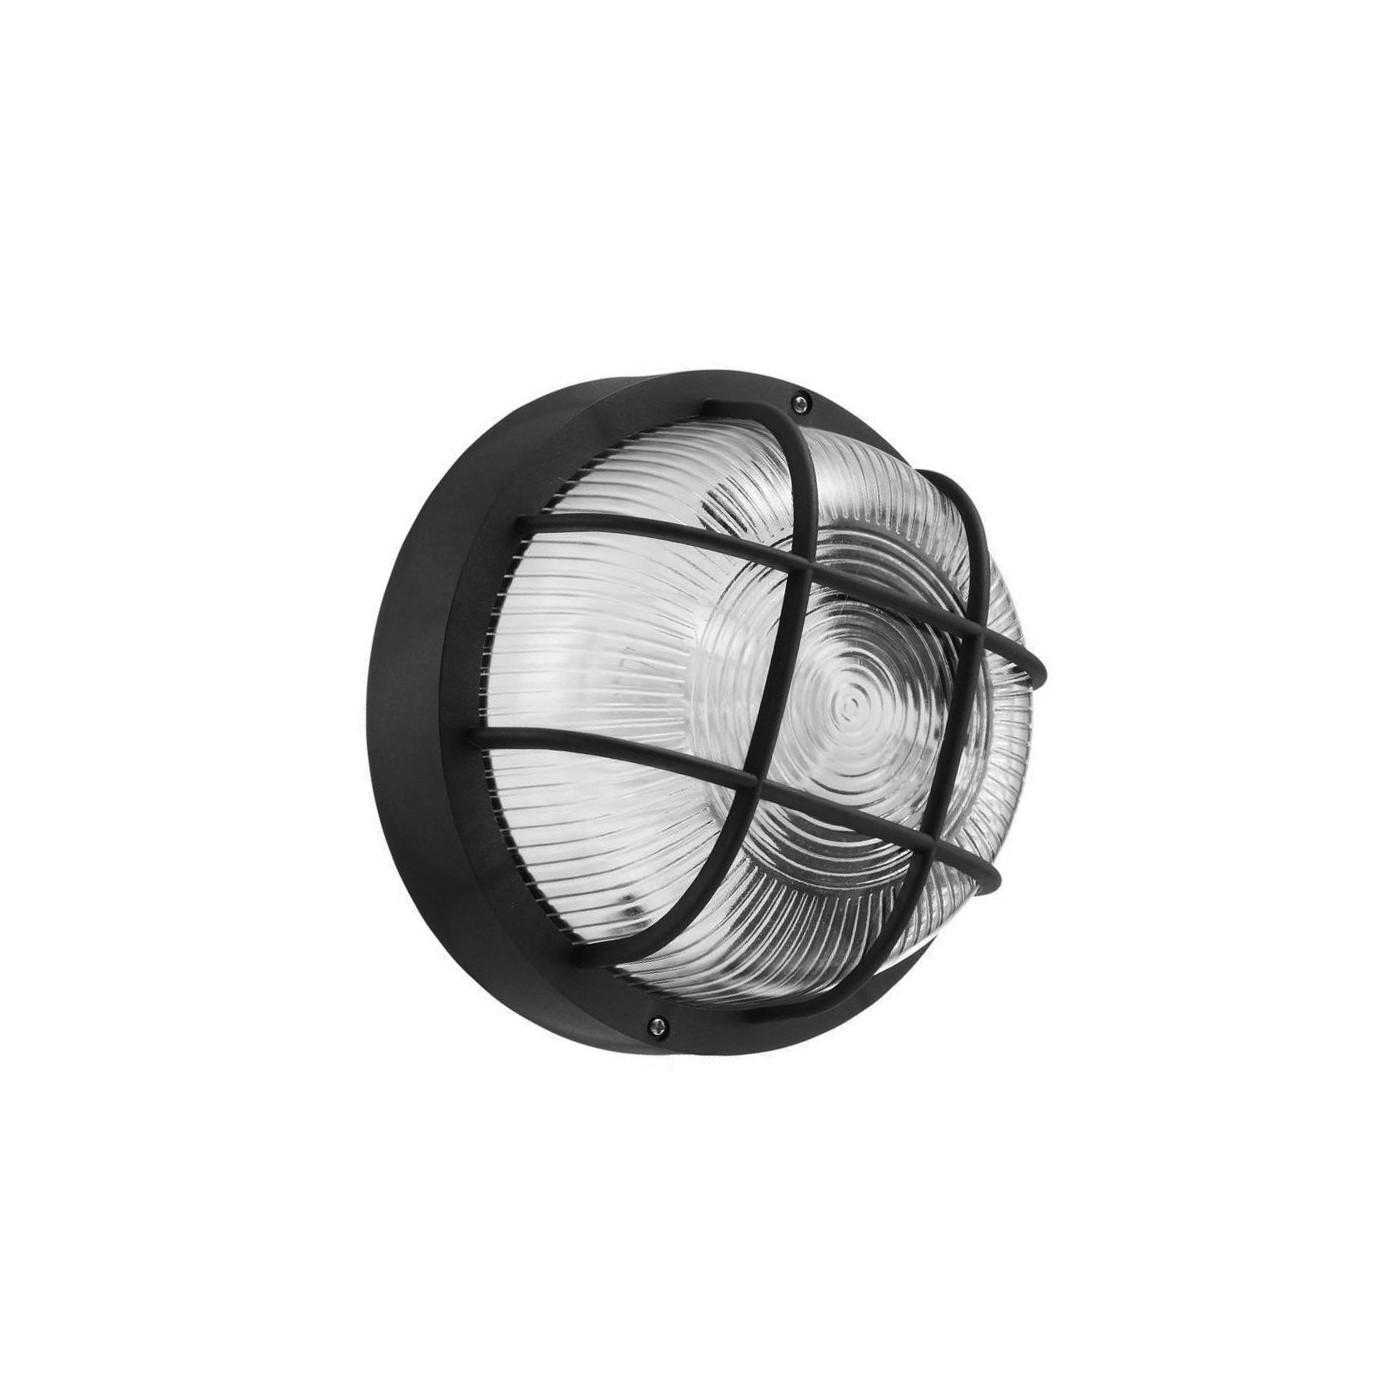 Lâmpada de exterior redonda bullseye (bulleye), preta E27  - 1